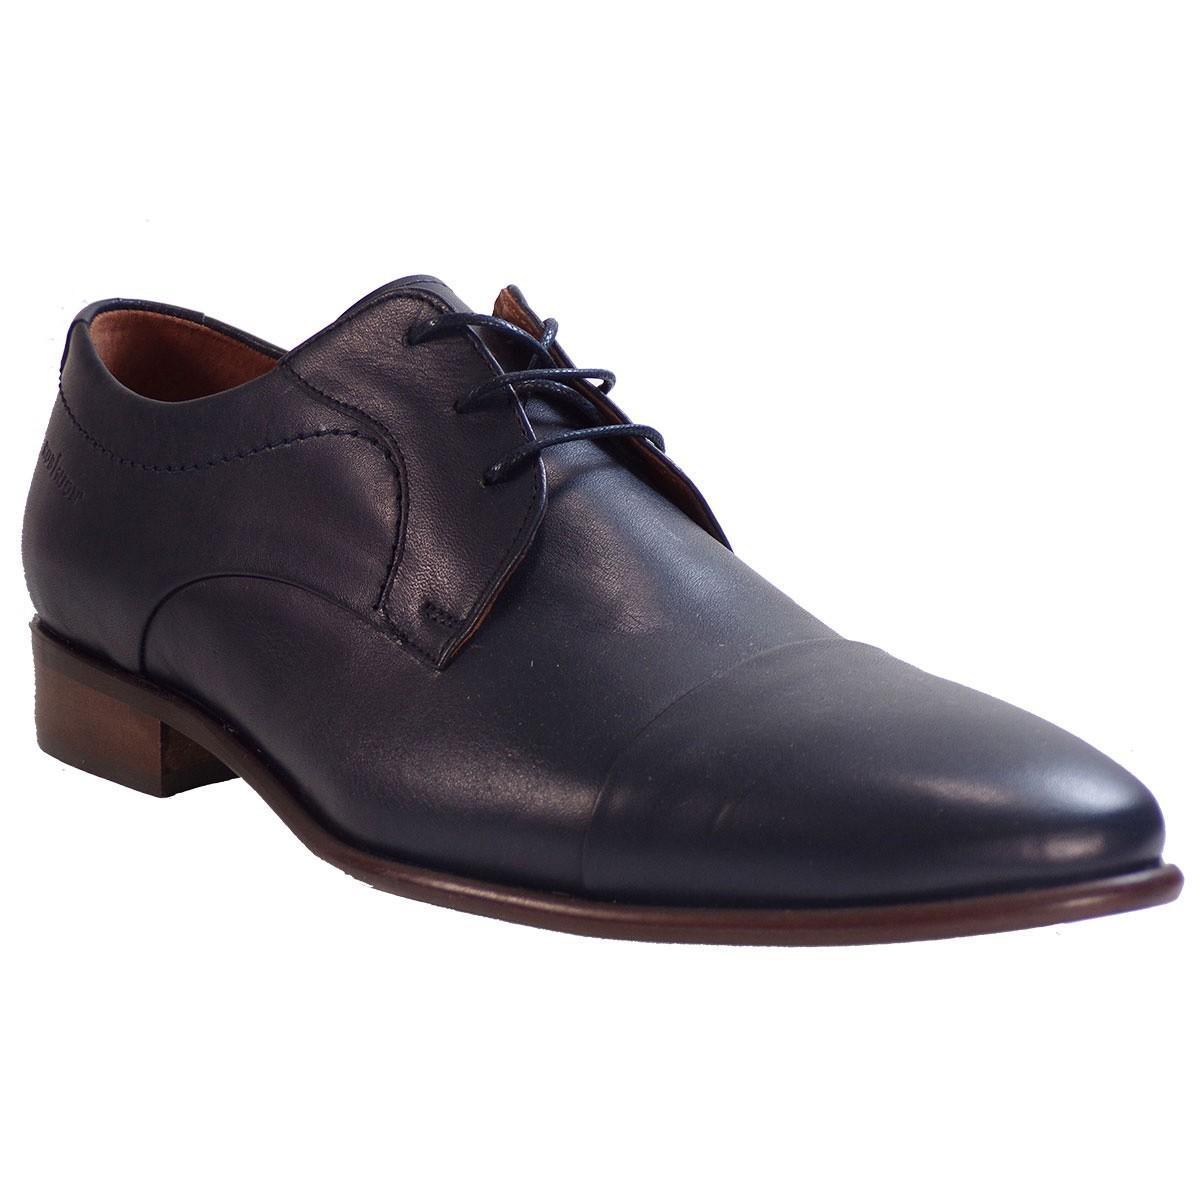 Robinson Ανδρικά Παπούτσια 2203 Μπλέ Δέρμα